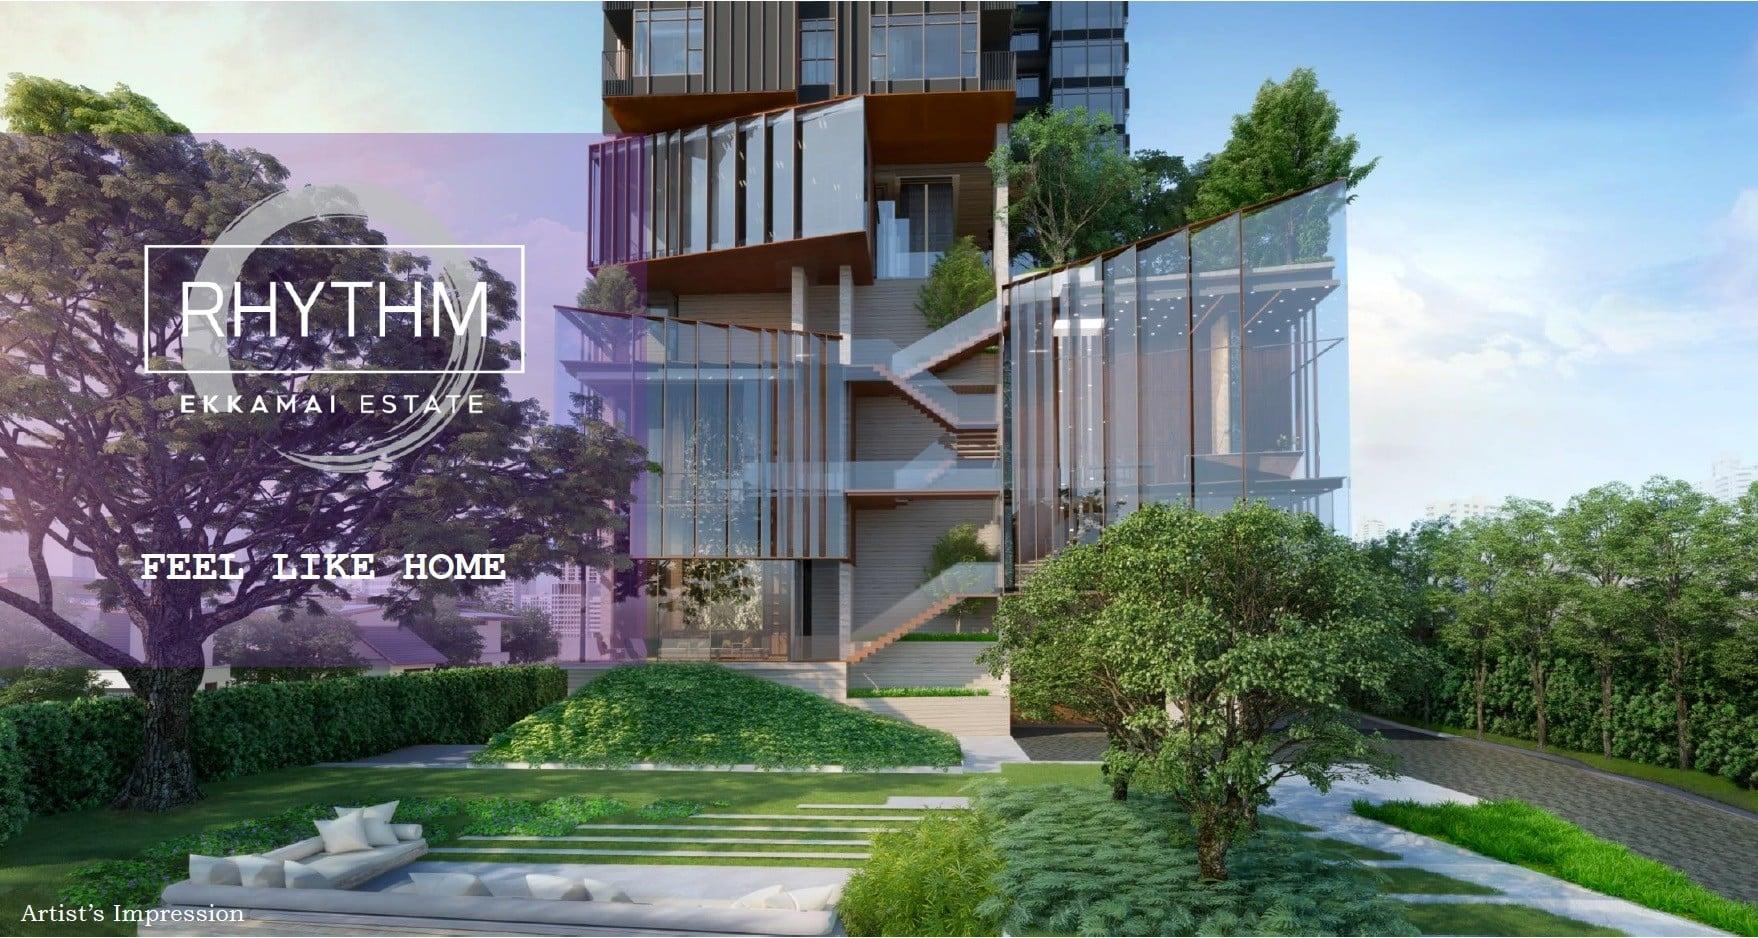 Rhythm-Ekkamai-Estate-Features-2